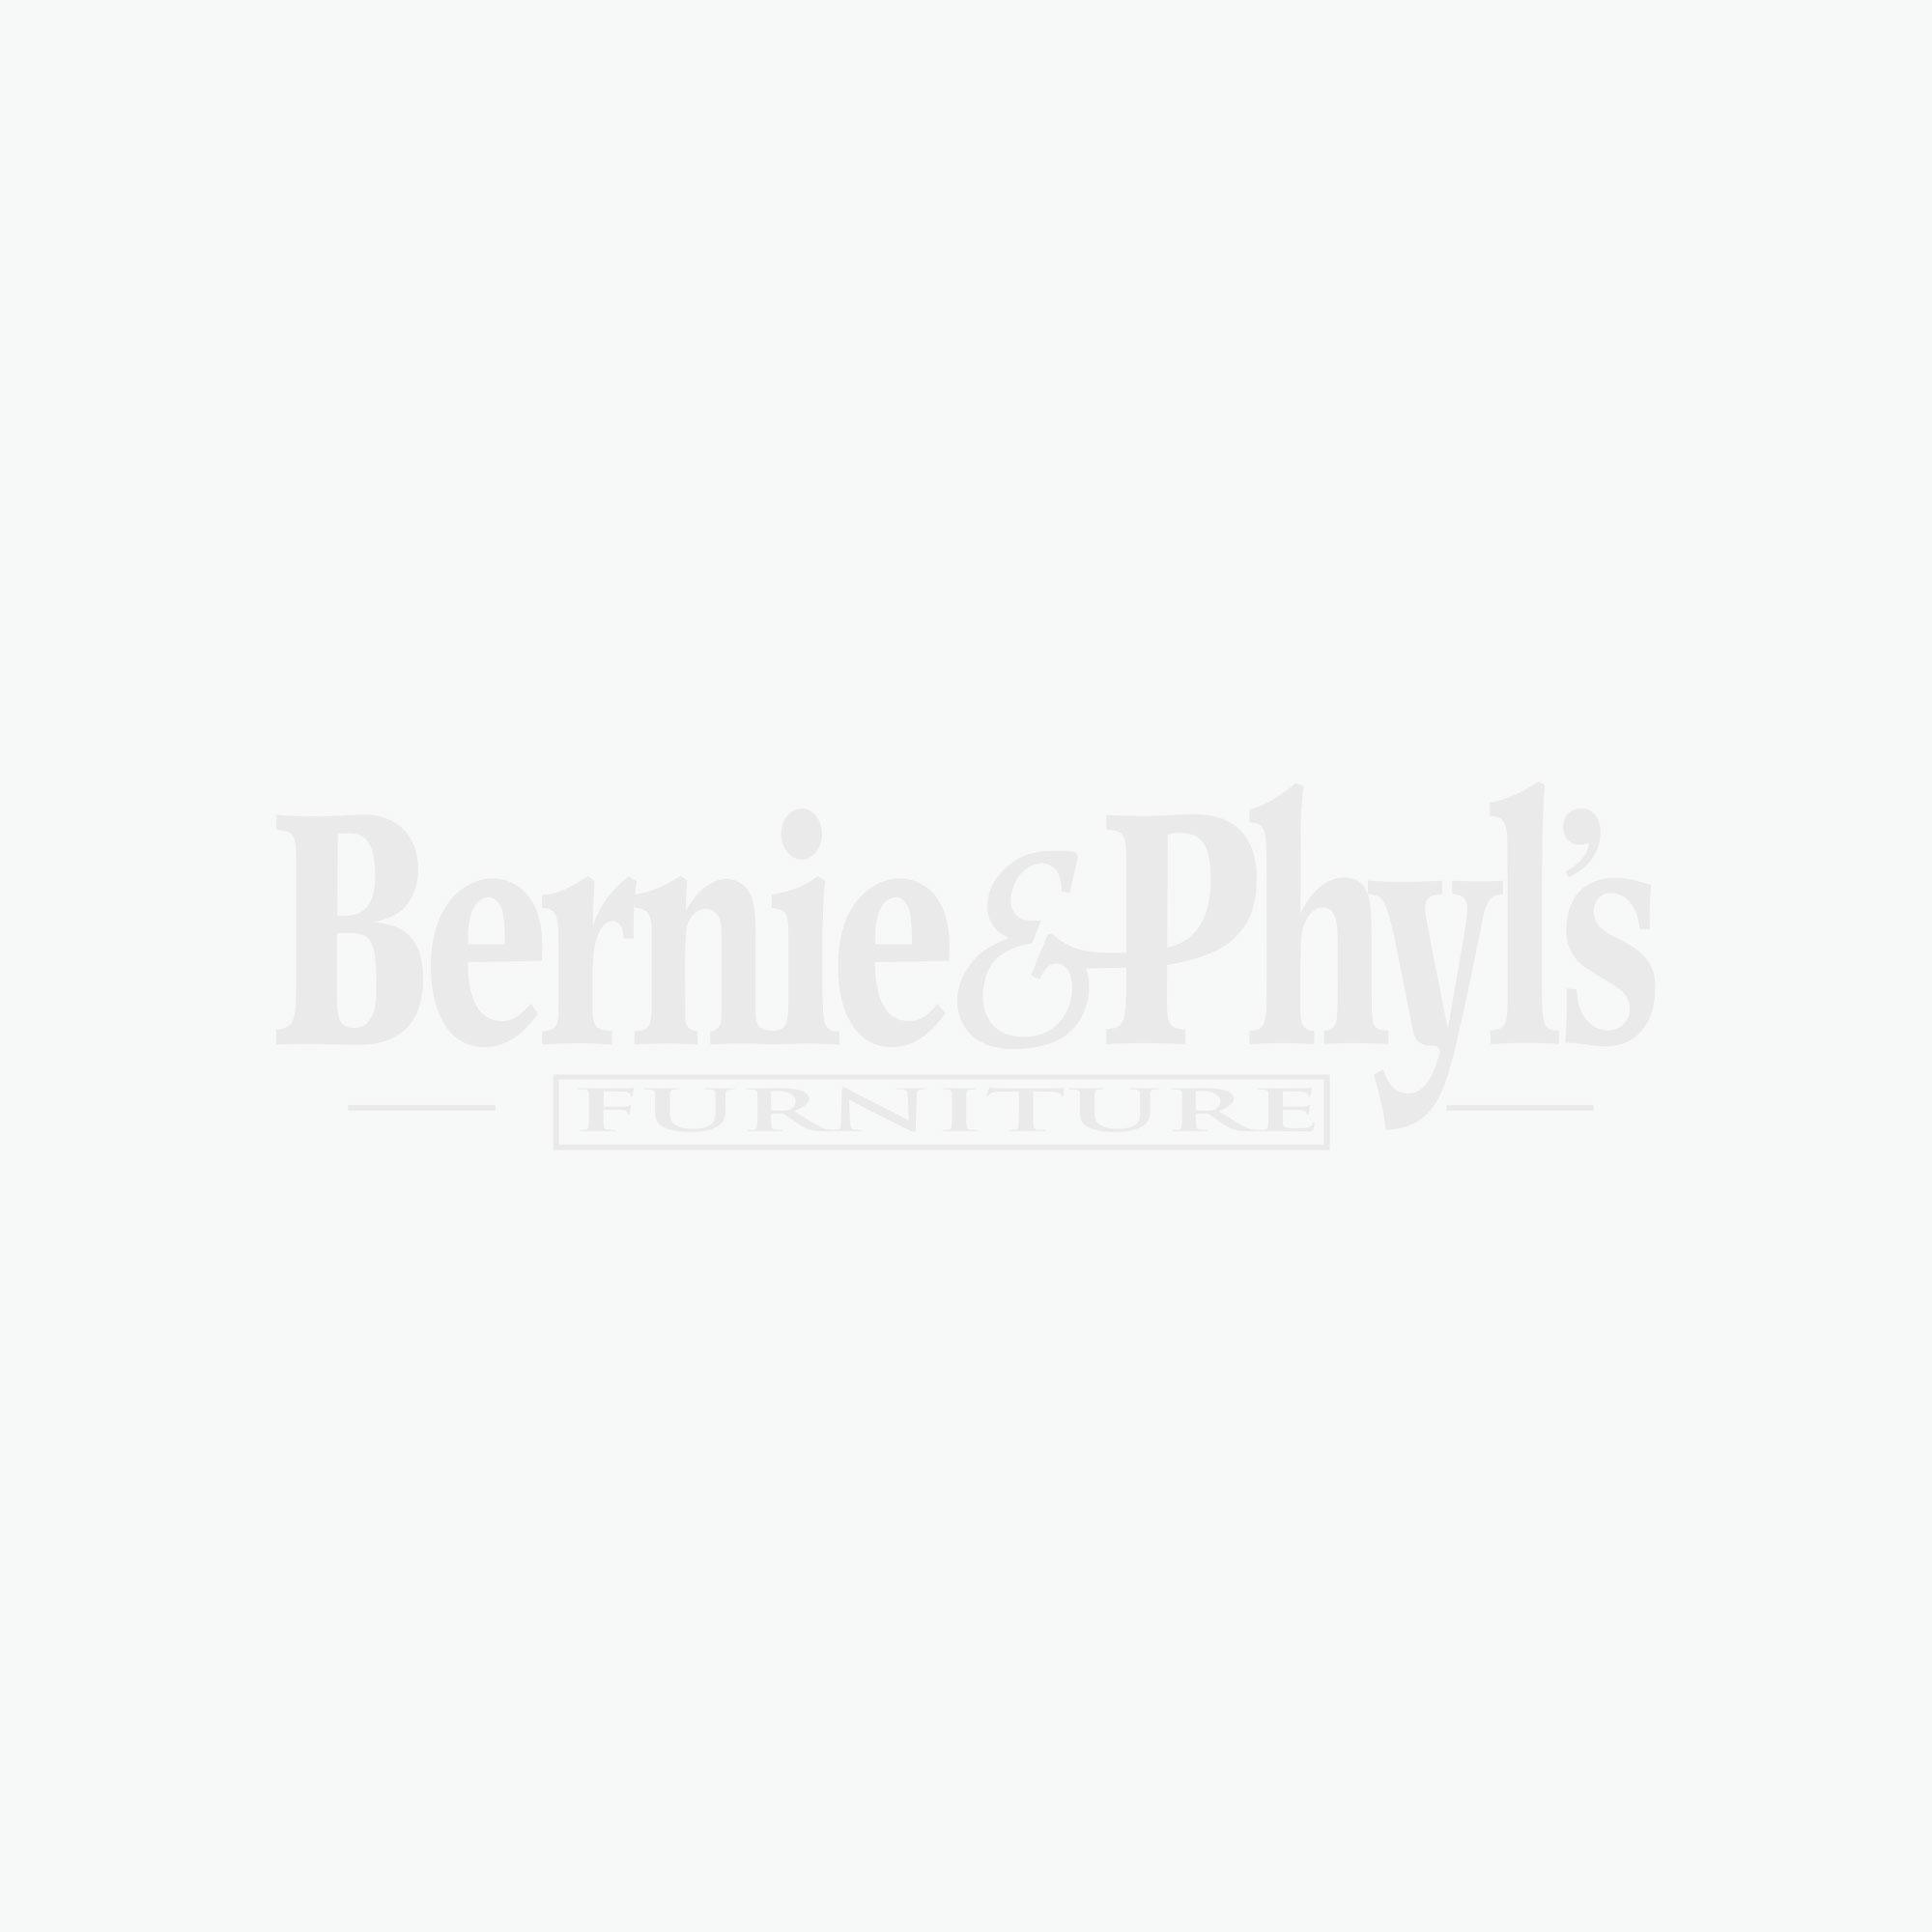 Greyson Sofa Bernie Amp Phyl S Furniture By Chateau D Ax